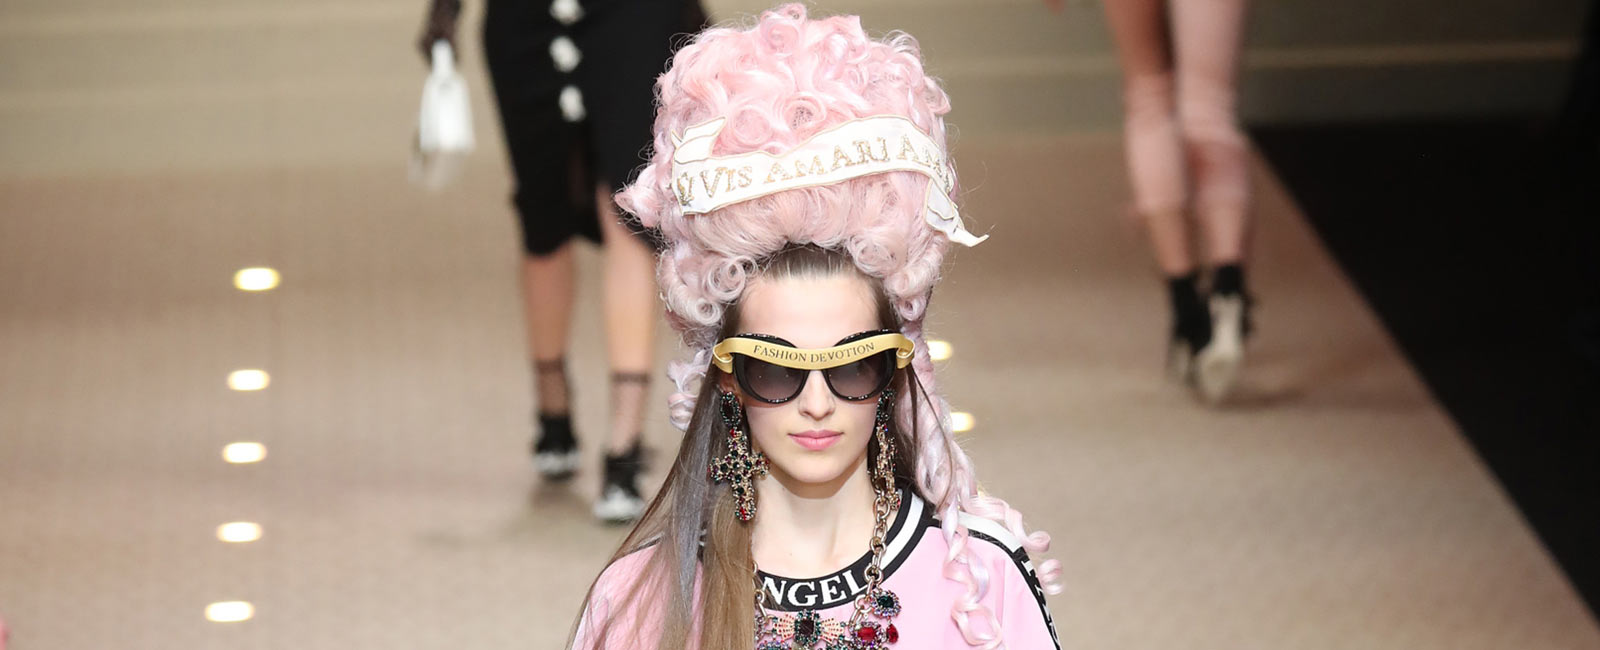 Milan Fashion Week: Dolce & Gabbana Otoño-Invierno 2018/2019